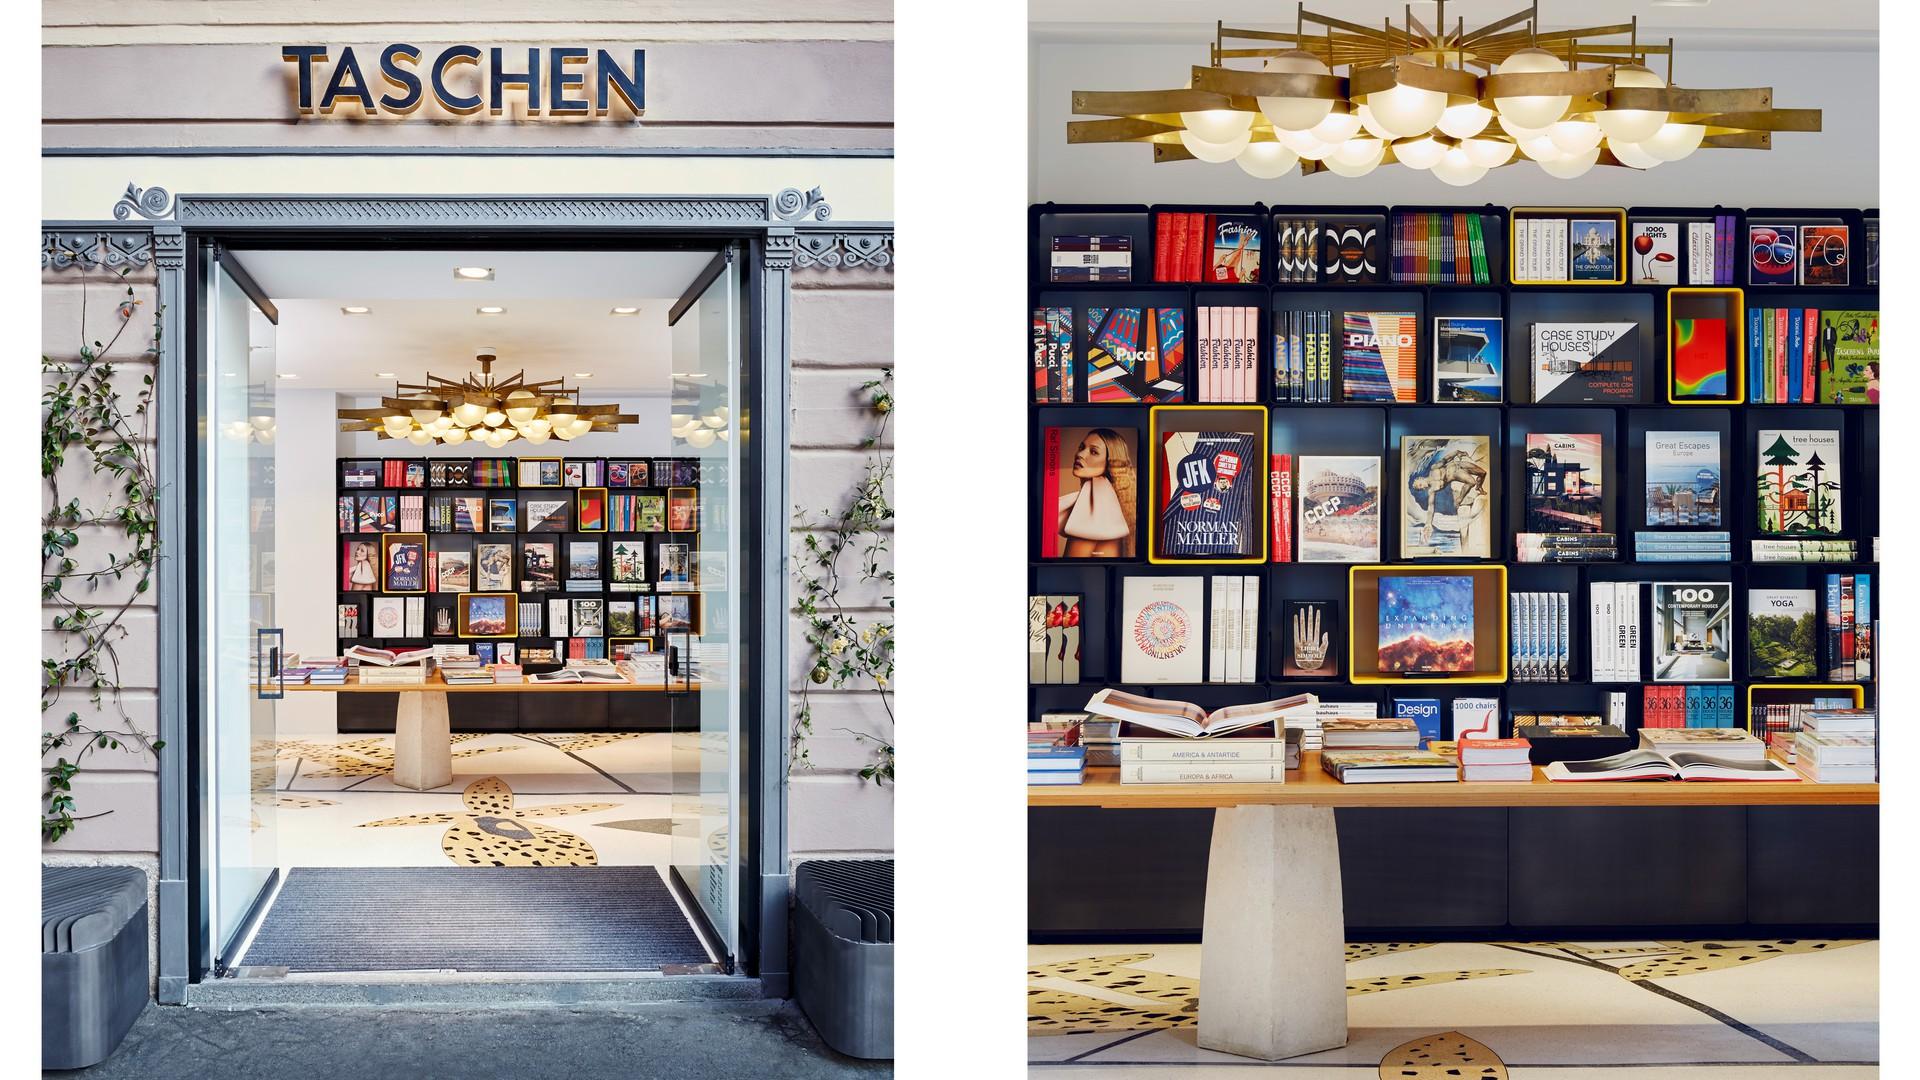 Taschen Milan Store Furniture Amp Display Systems Marc